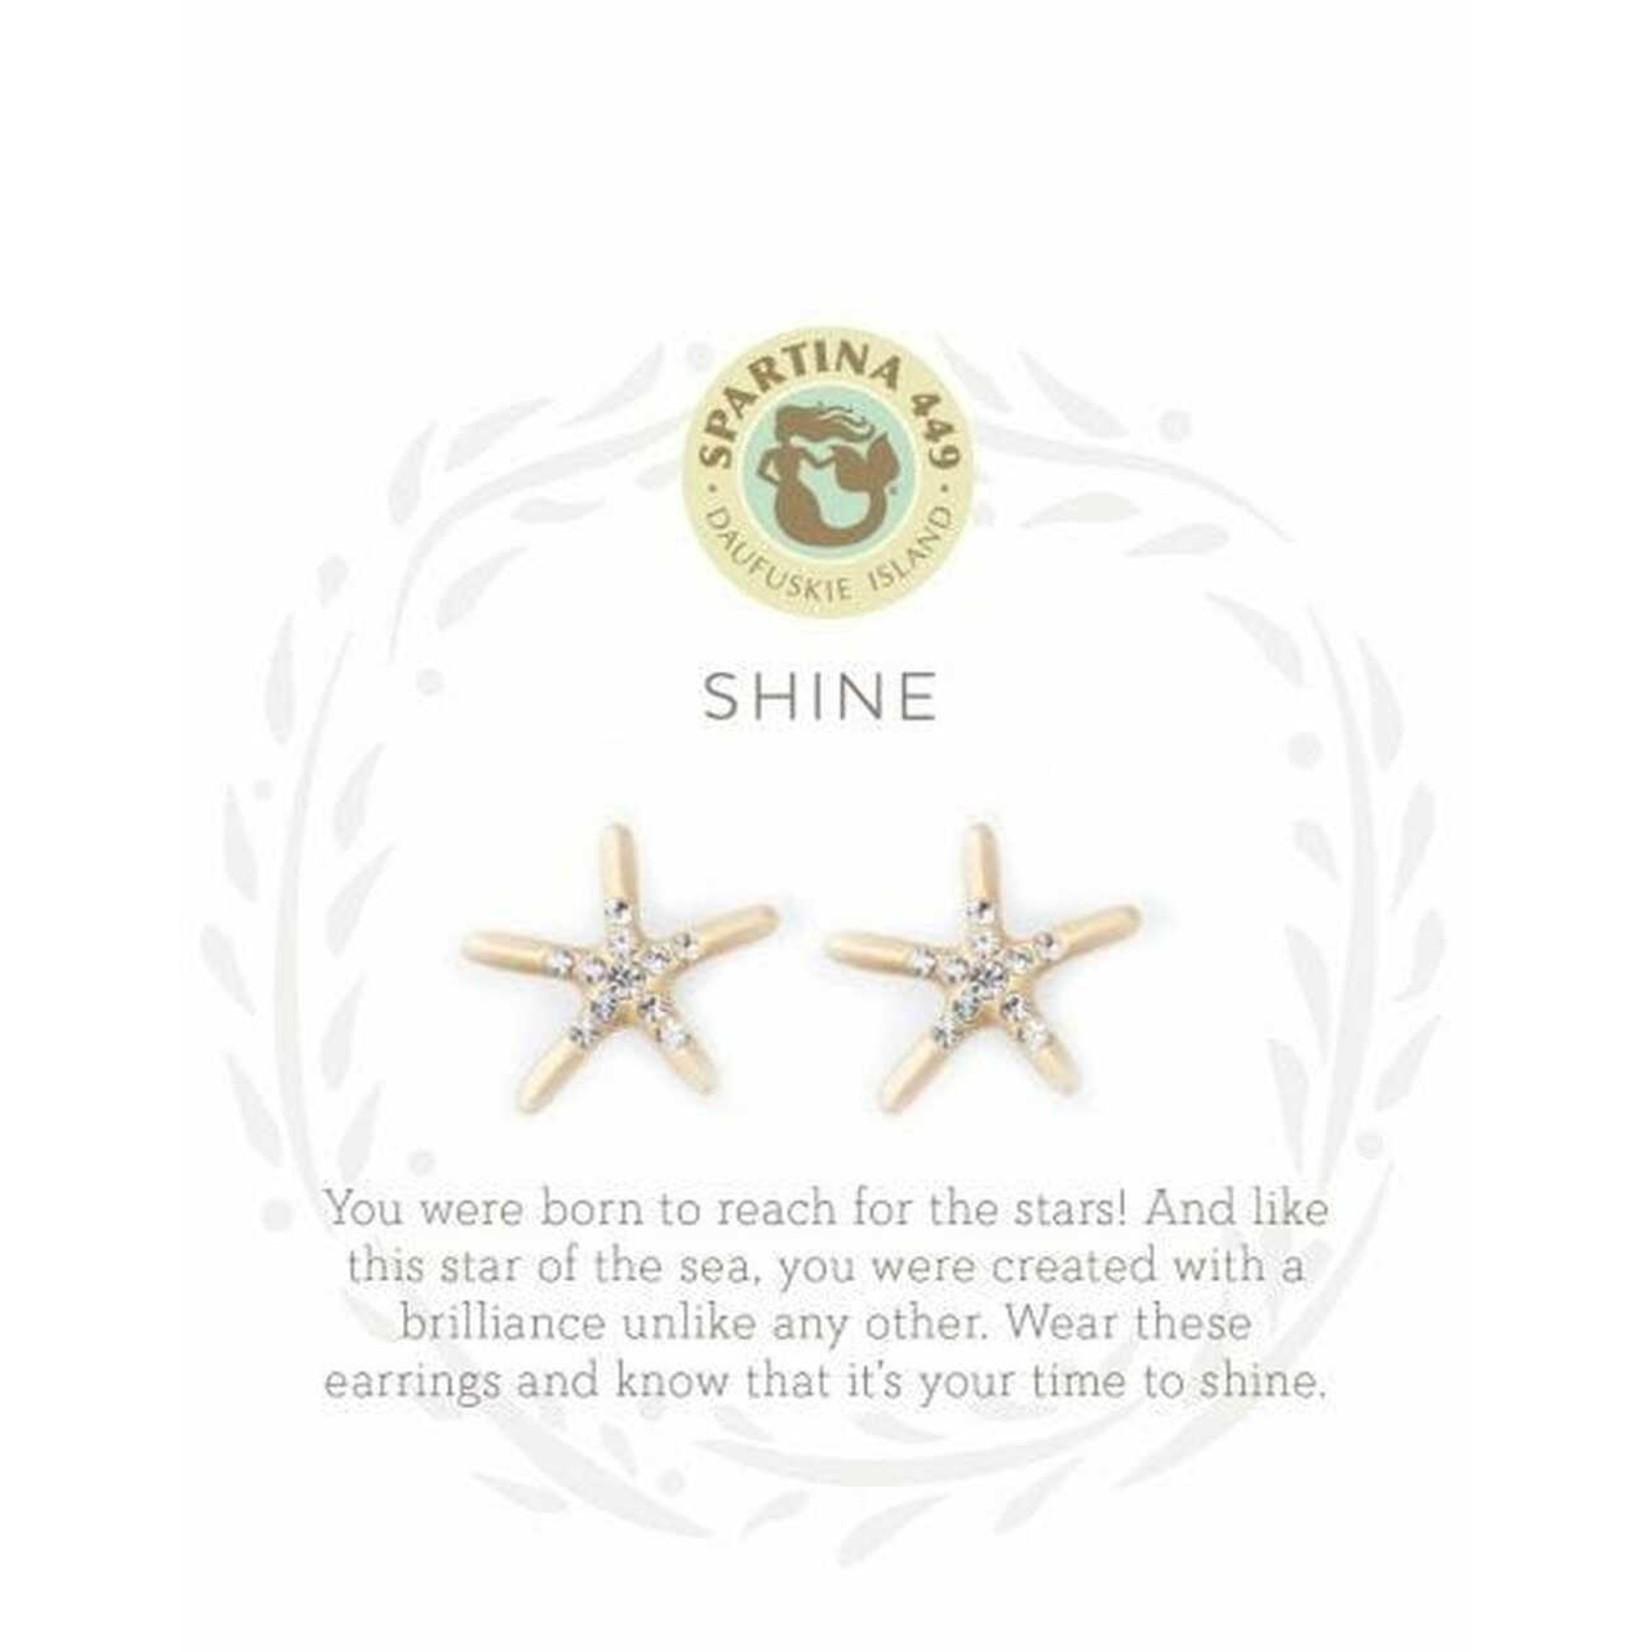 Spartina Sea La Vie Stud Earrings/Shine/Starfish